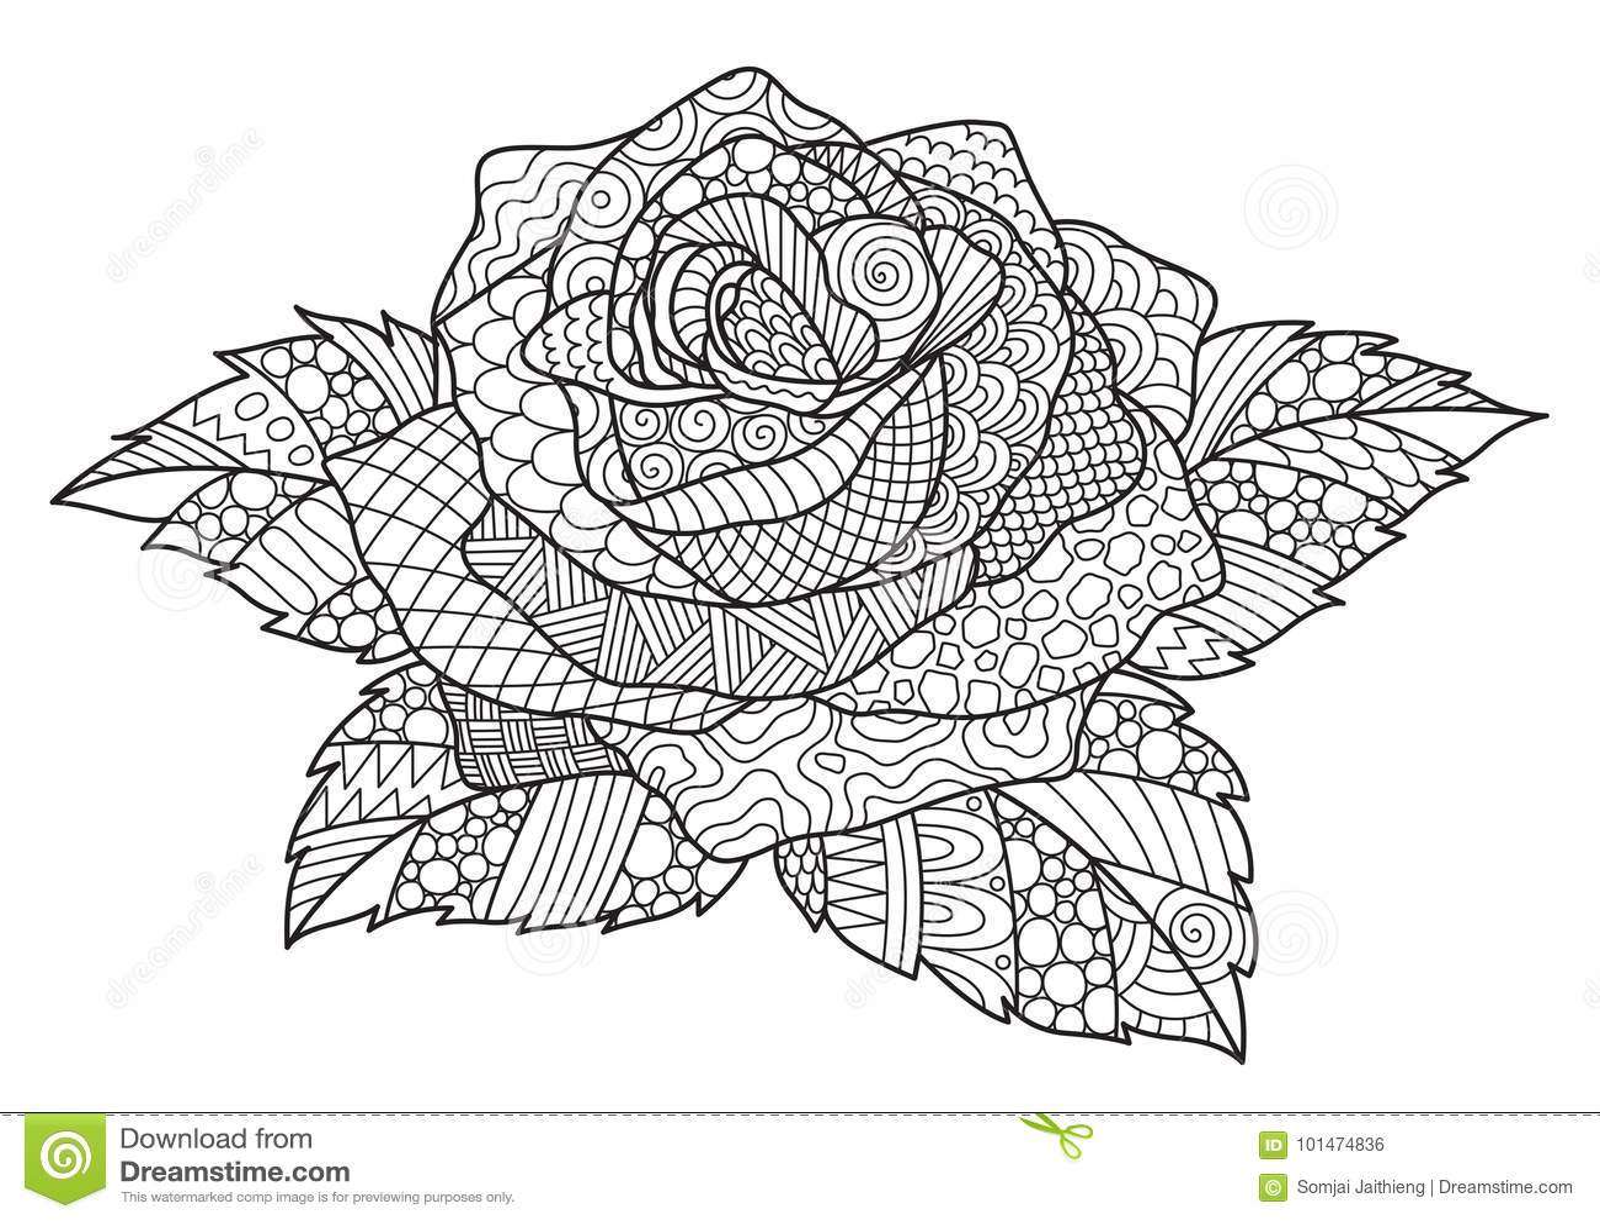 Zendoodle Design Of Rose For Design Element And Adult ...